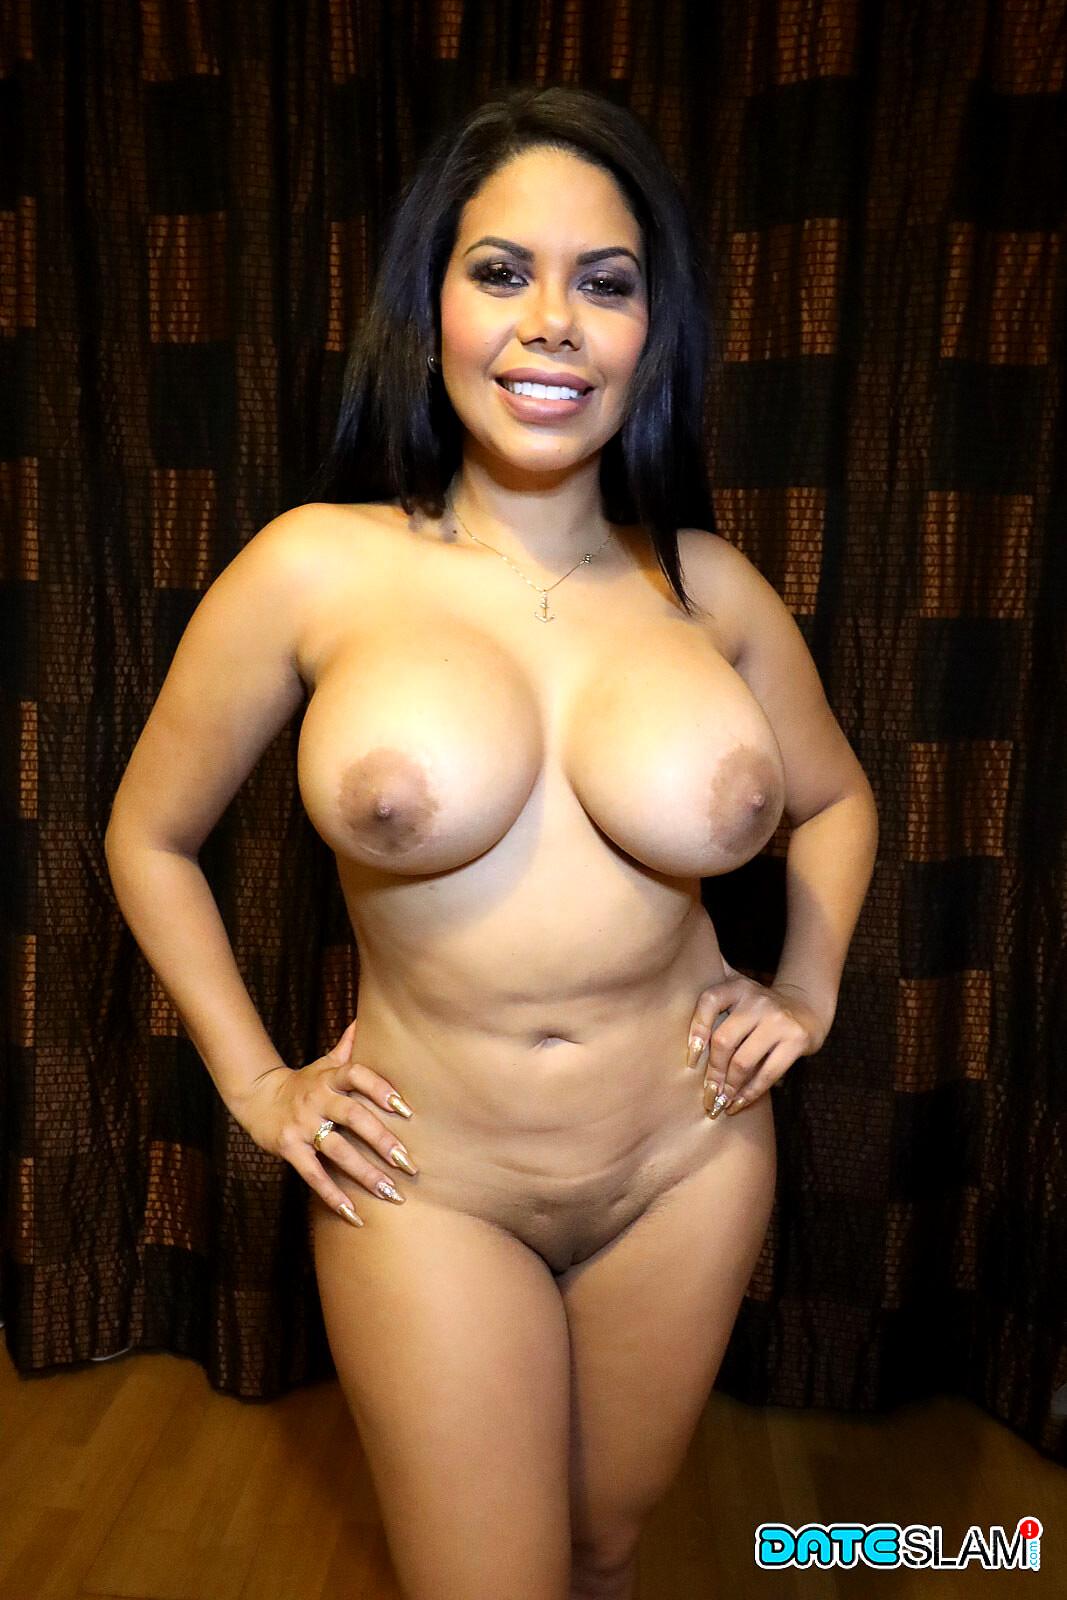 Mandy collins nude